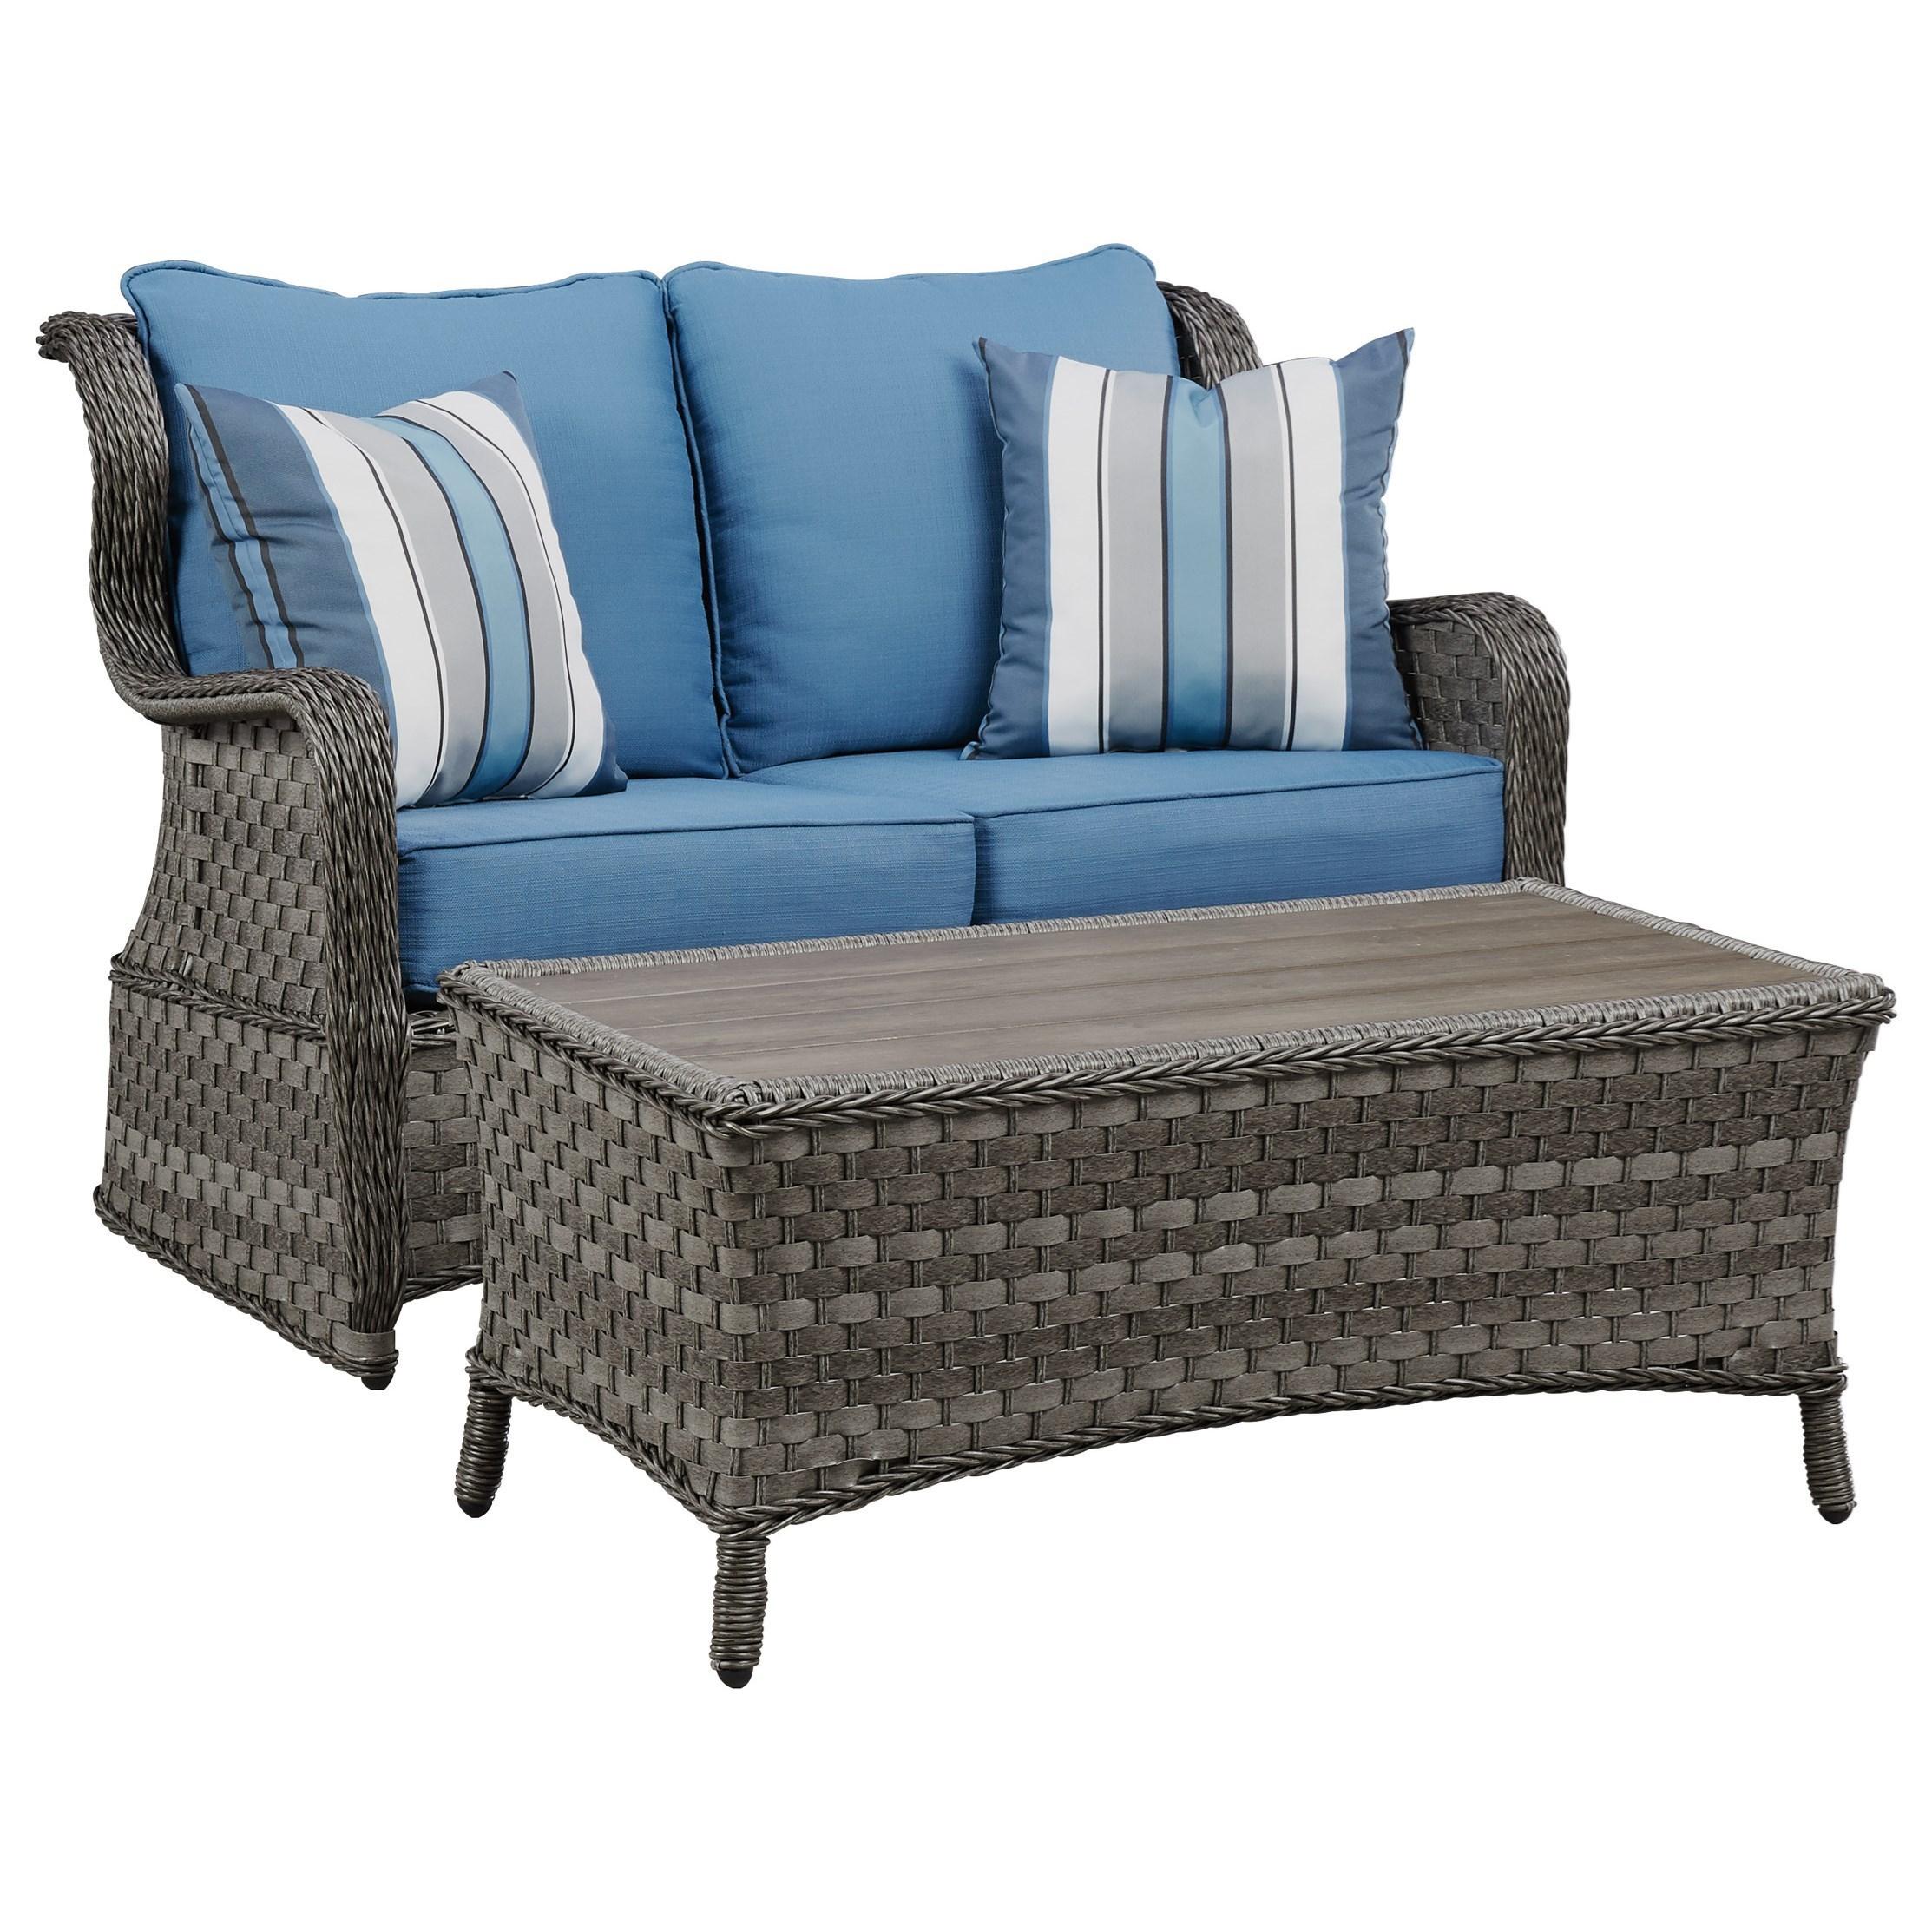 Signature Design By Ashley Abbots Court Outdoor Loveseat Glider W/ Table    John V Schultz Furniture   Outdoor Loveseats